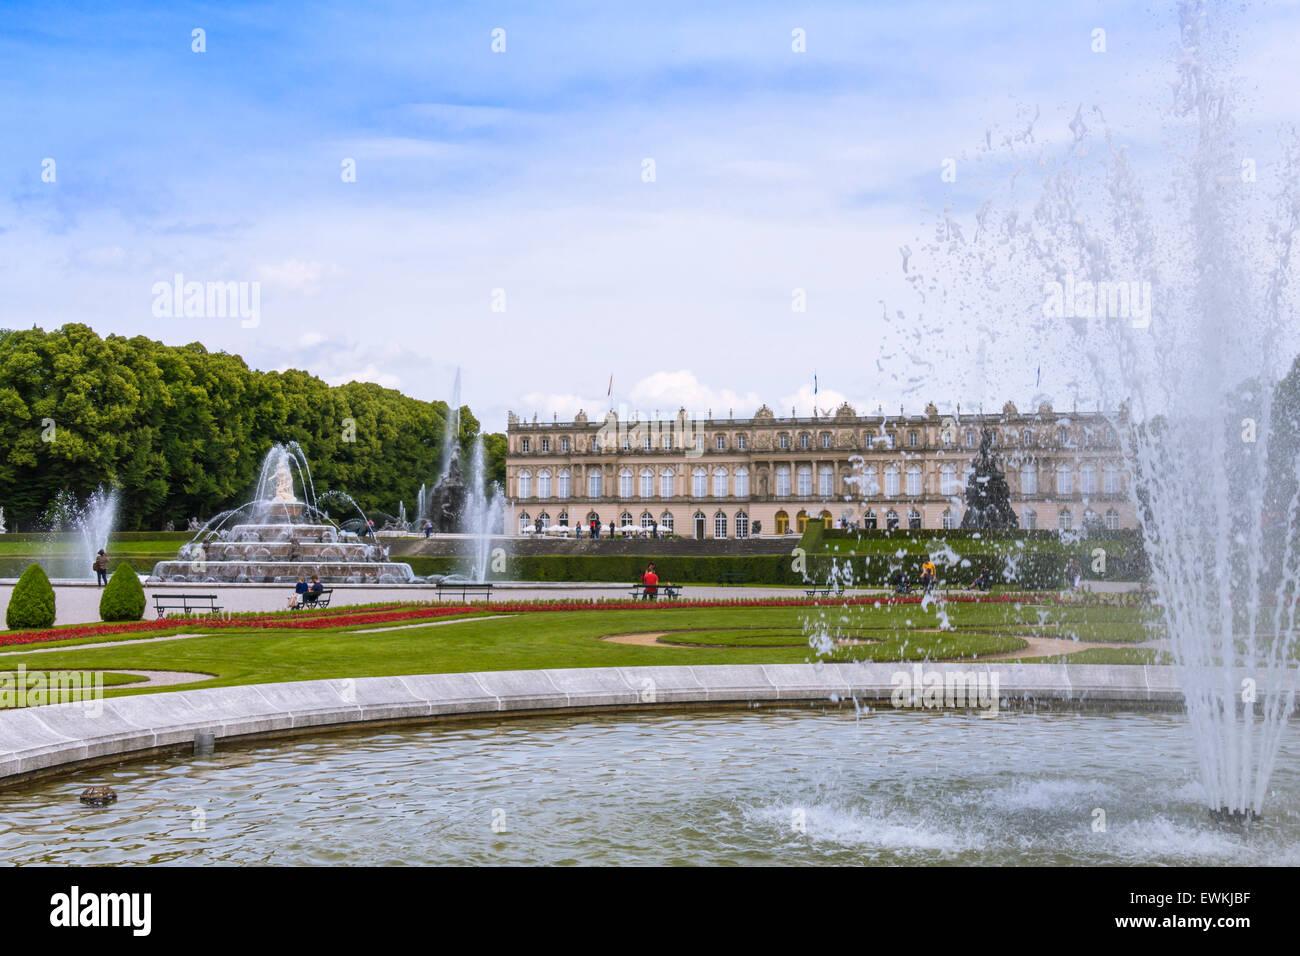 Herrenchiemsee Palace, palace gardens, Herreninsel, Chiemsee, Chiemgau, Upper Bavaria, Bavaria, Germany, Europe - Stock Image